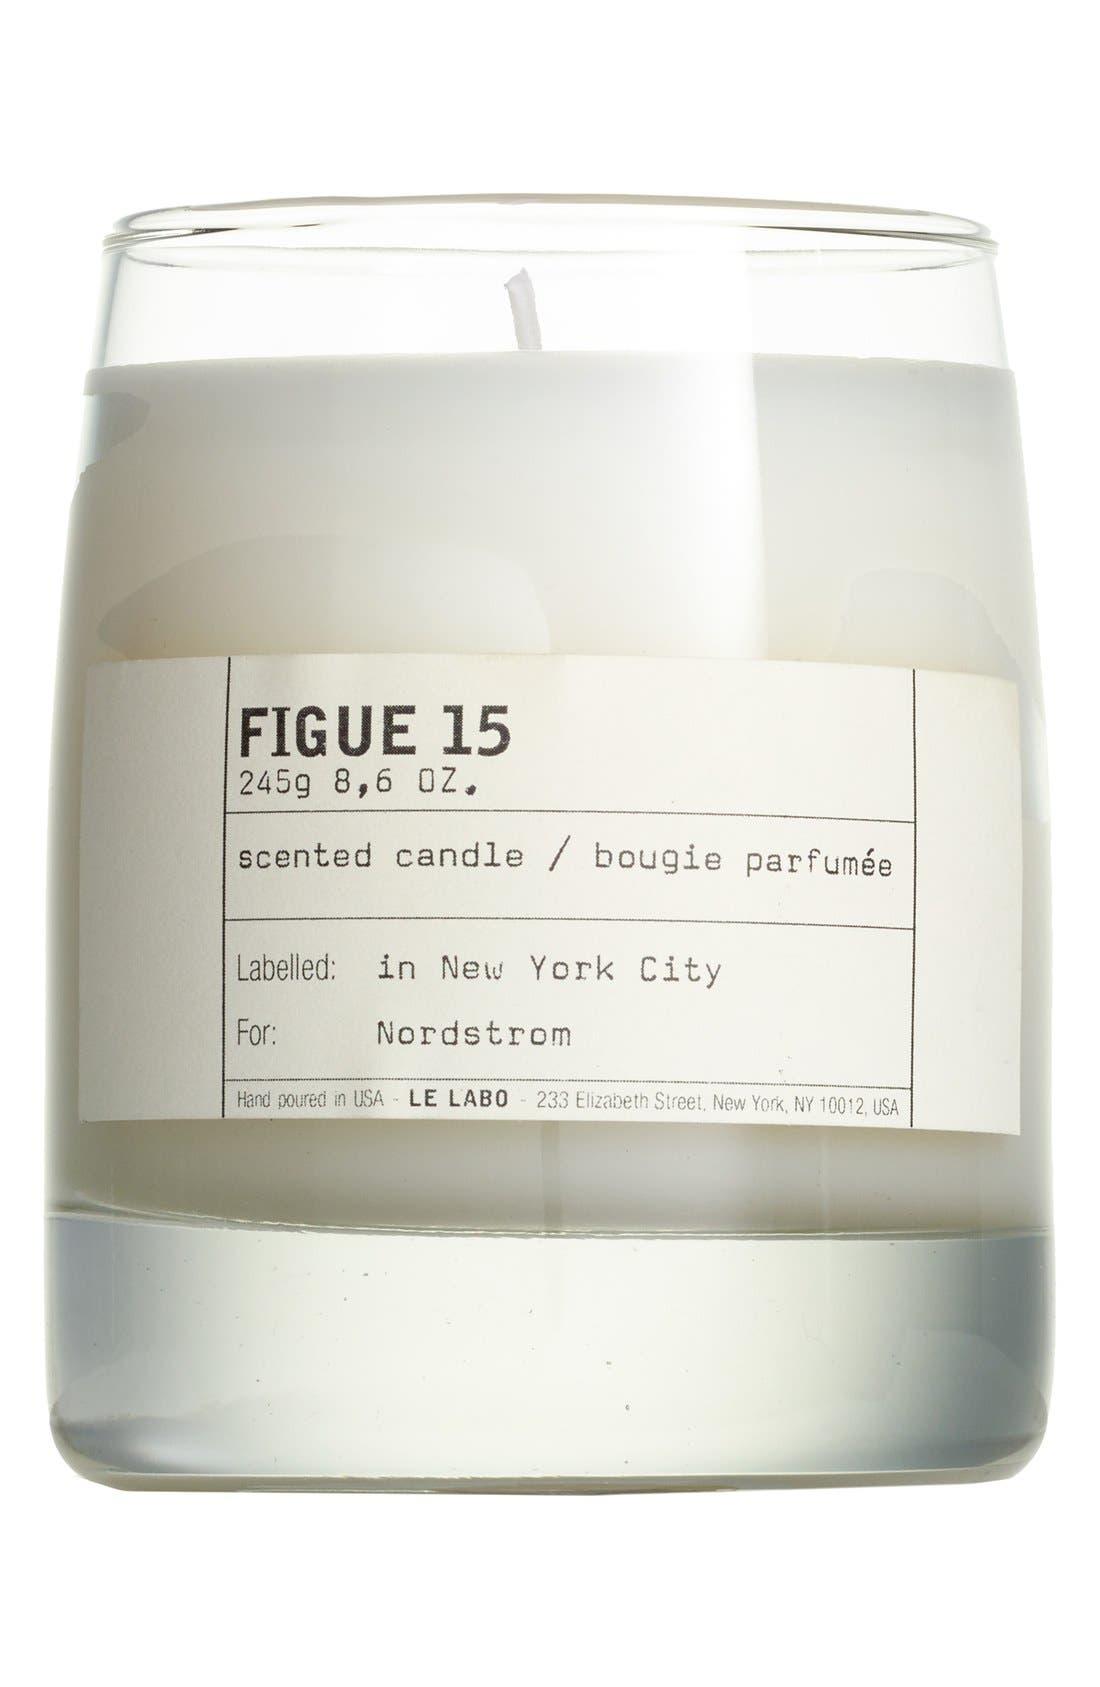 Le Labo 'Figue 15' Classic Candle